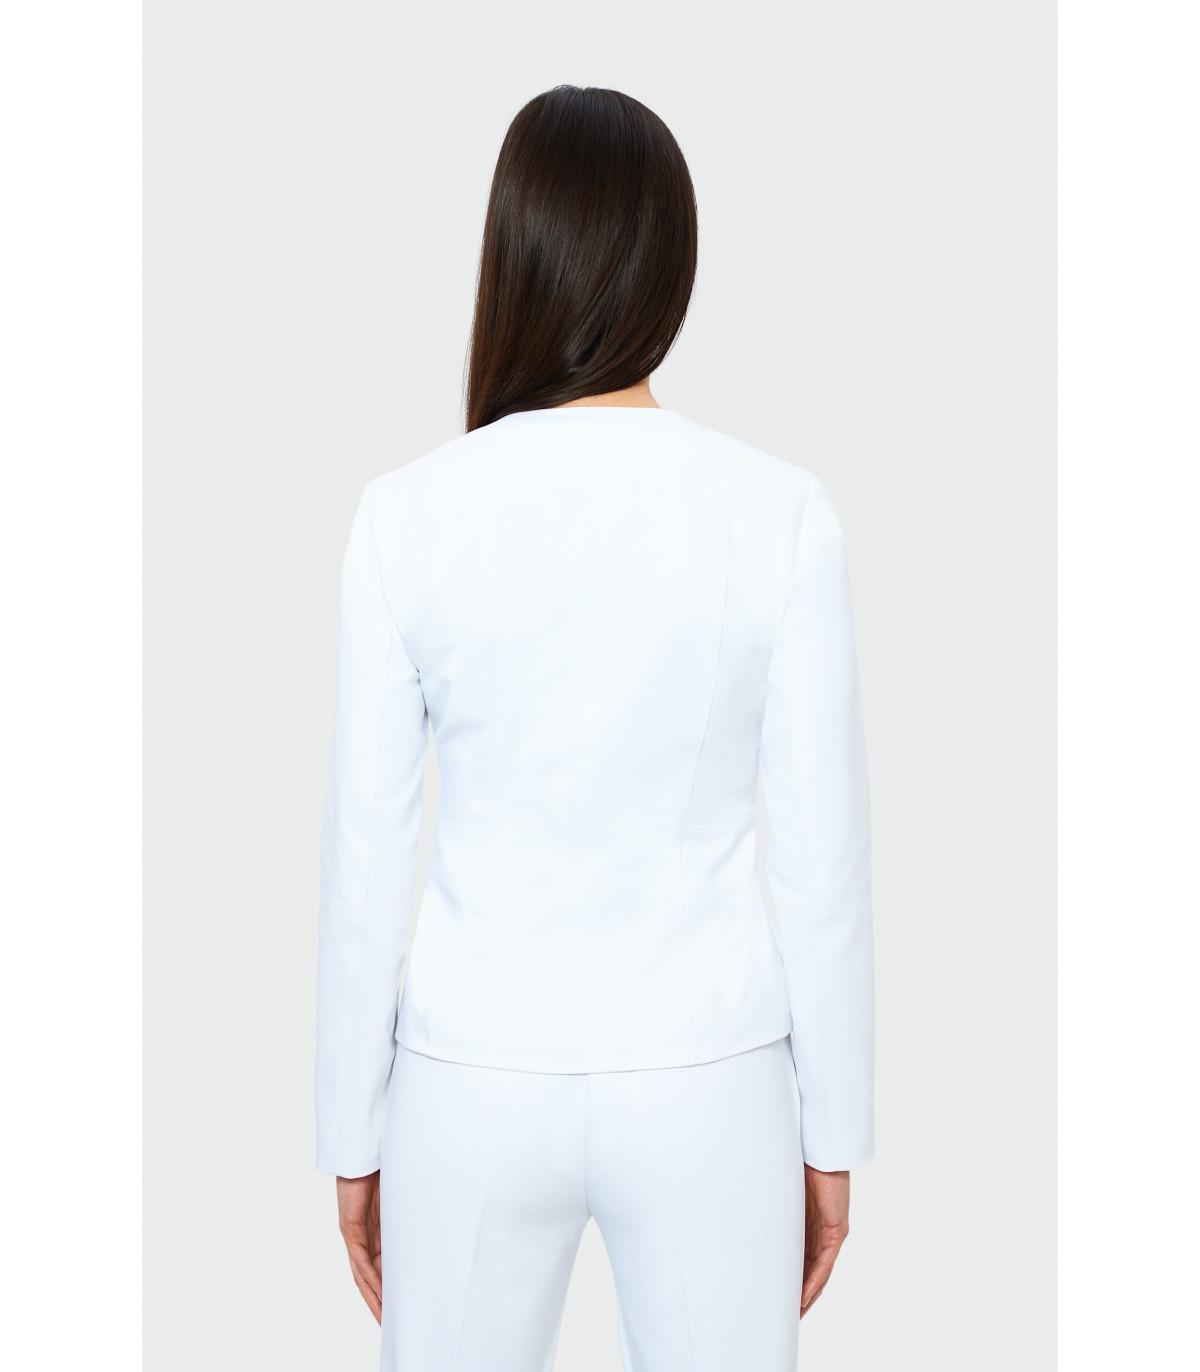 48b91ced0151 Elegantné biele nohavice